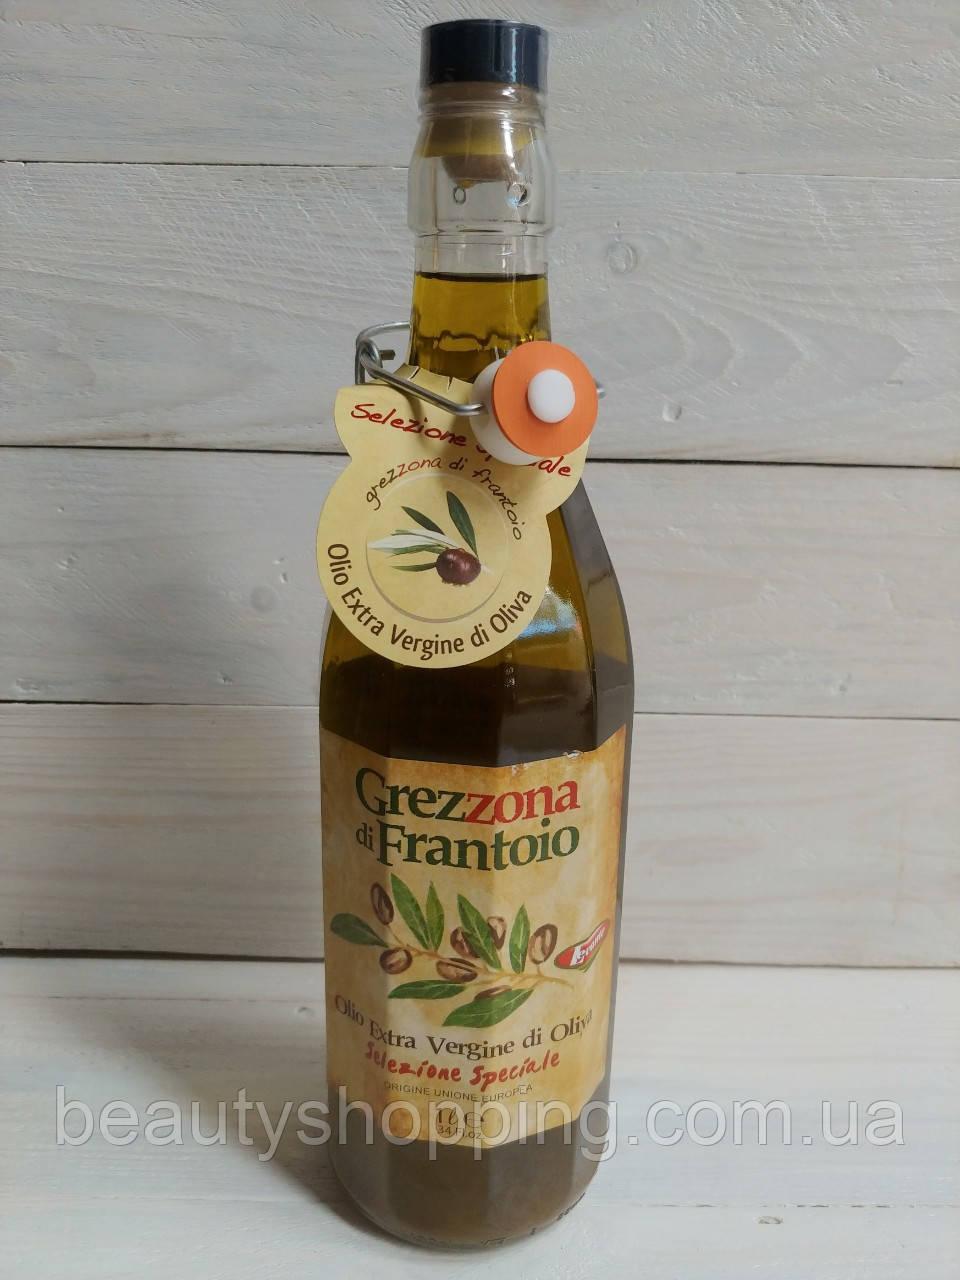 Оливковое нефильтрованное масло Grezzona Di Frantoio Extra Vergine di Oliva 1 литр Италия